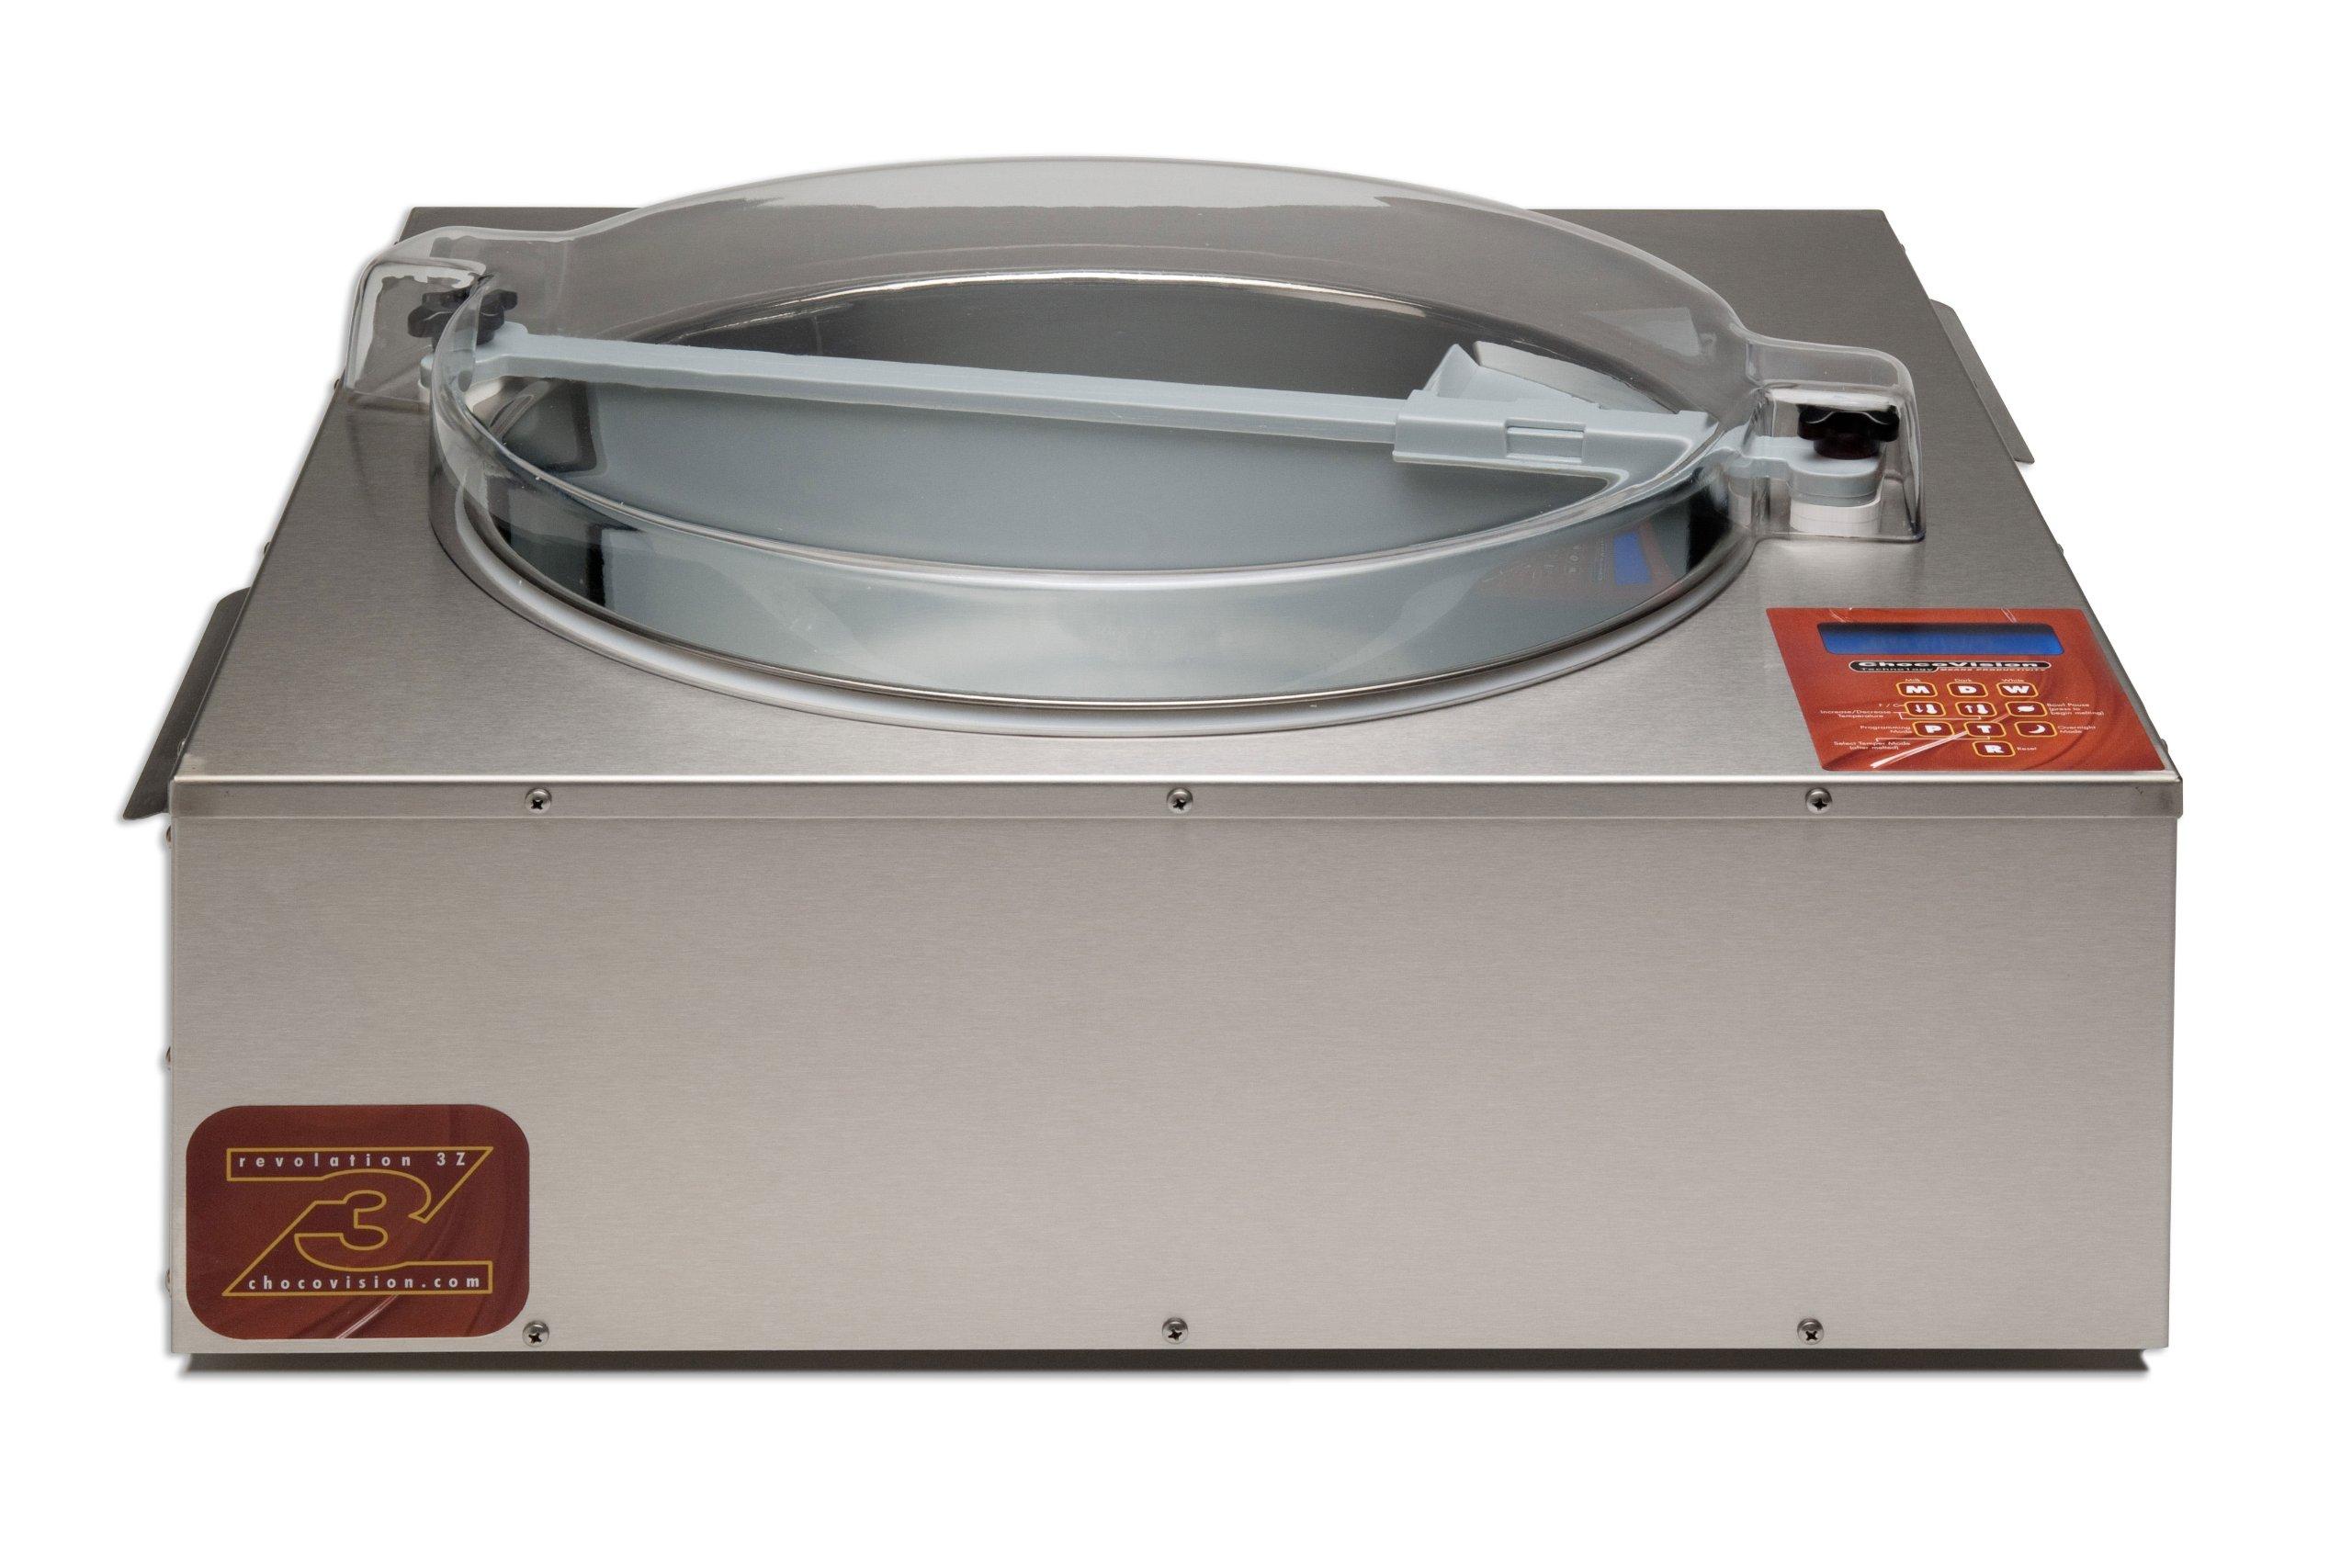 ChocoVision Revolation 3Z Chocolate Tempering Machine, 45 lb. Capacity